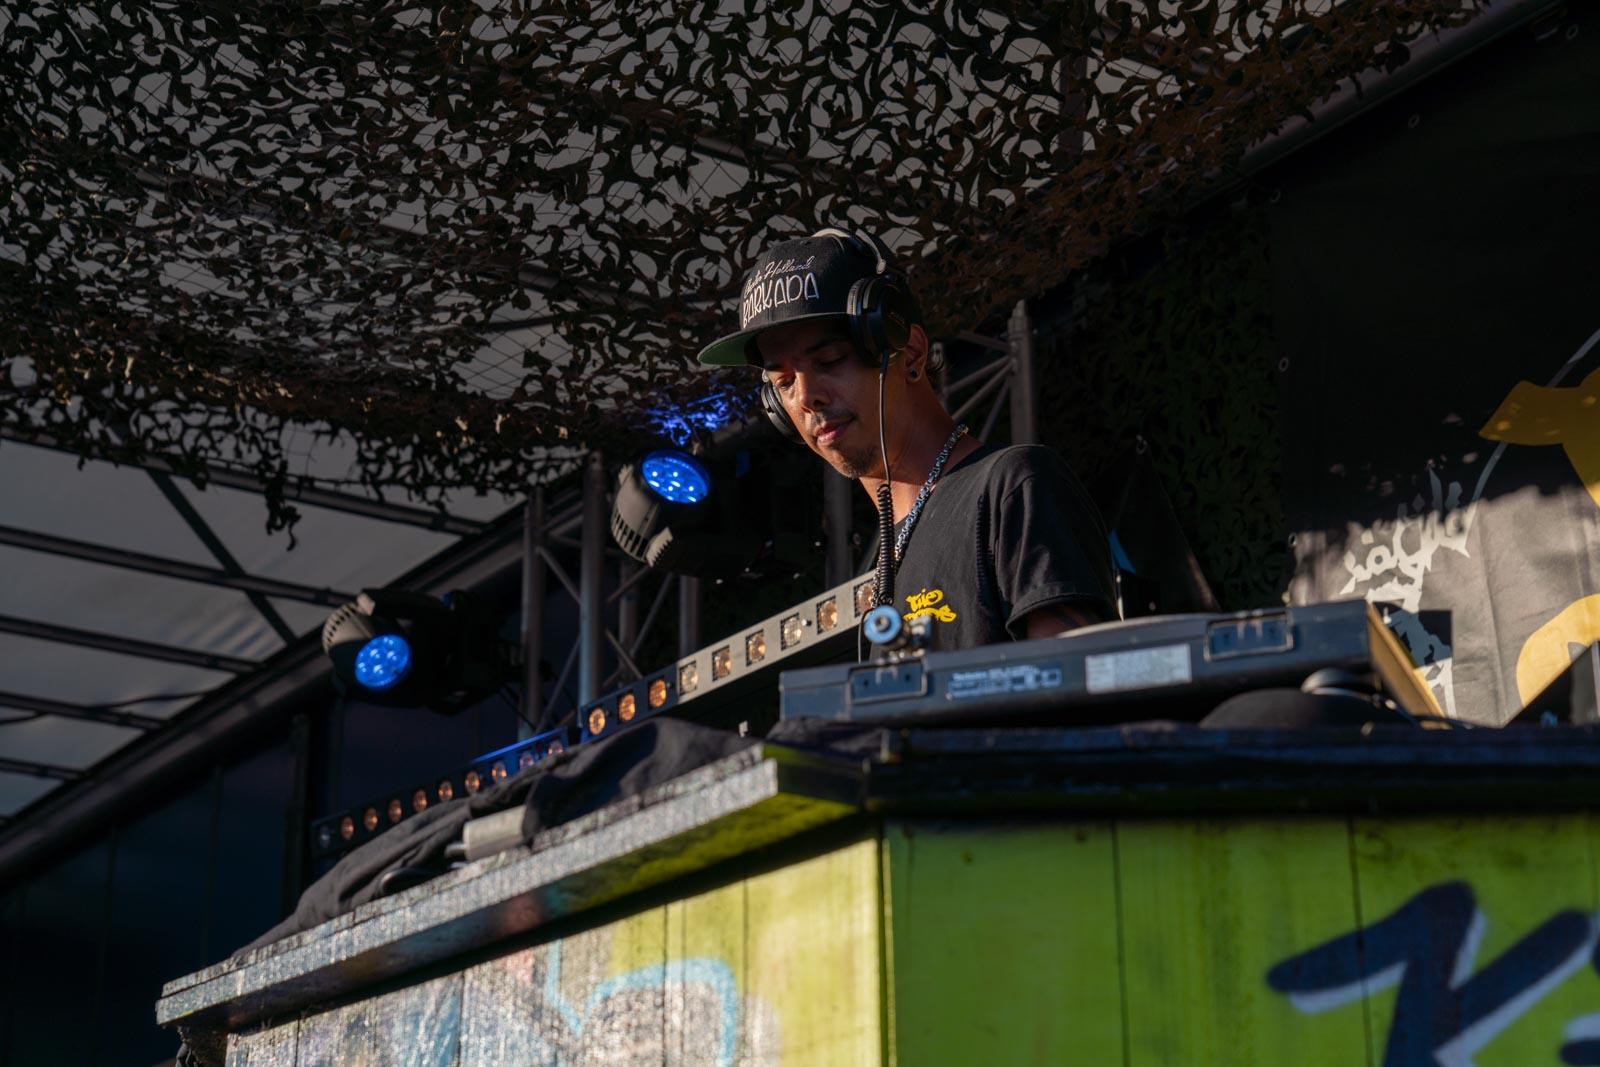 Huis DJ Skinny D bij de Graffiti Jam in 2019